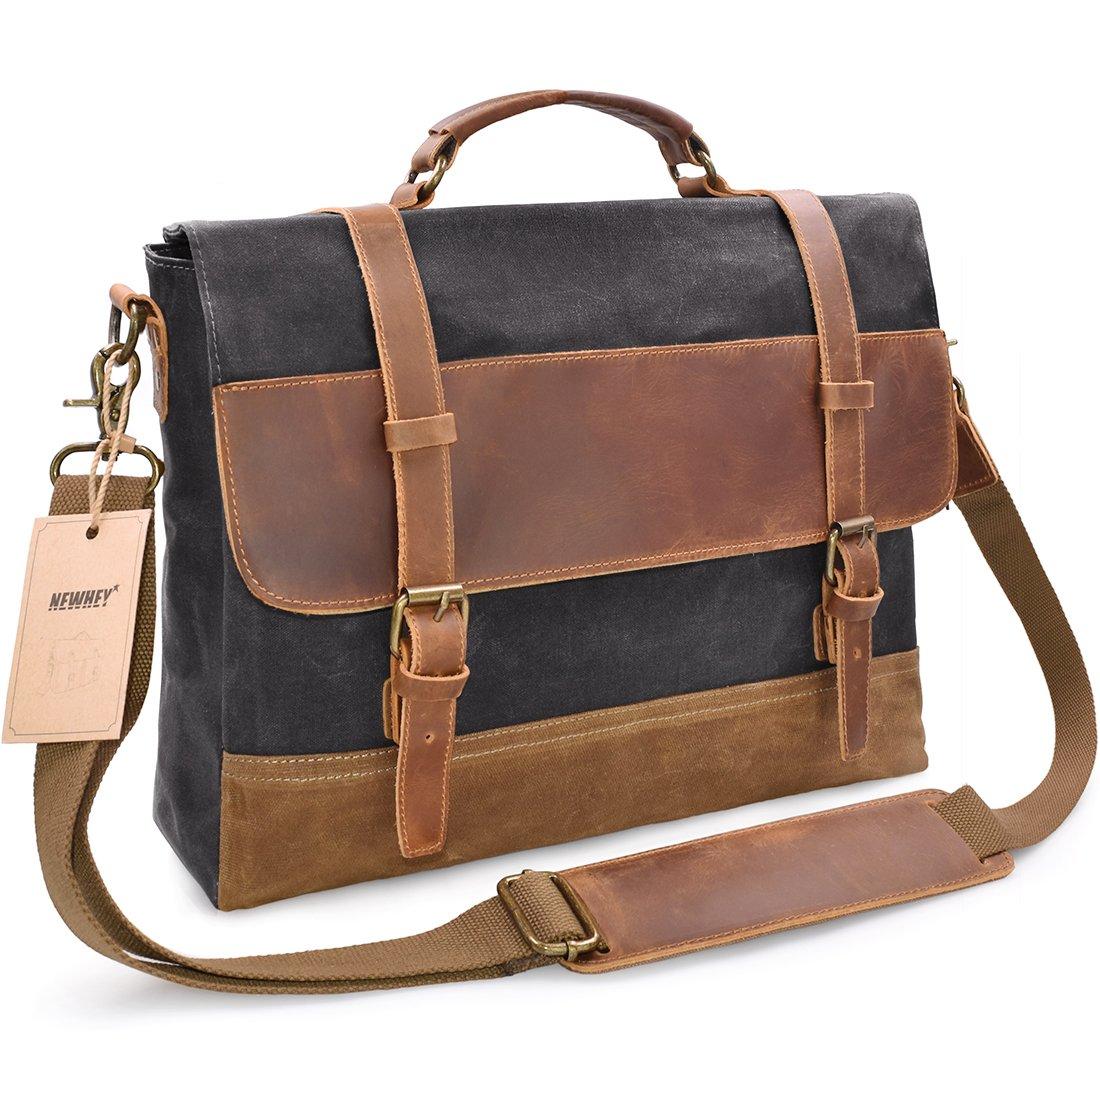 NEWHEY Mens Messenger Bag Waterproof Canvas Leather Computer Laptop Bag 15.6 Inch Briefcase Case Vintage Retro Waxed Canvas Genuine Leather Large Satchel Shoulder Bag College Grey